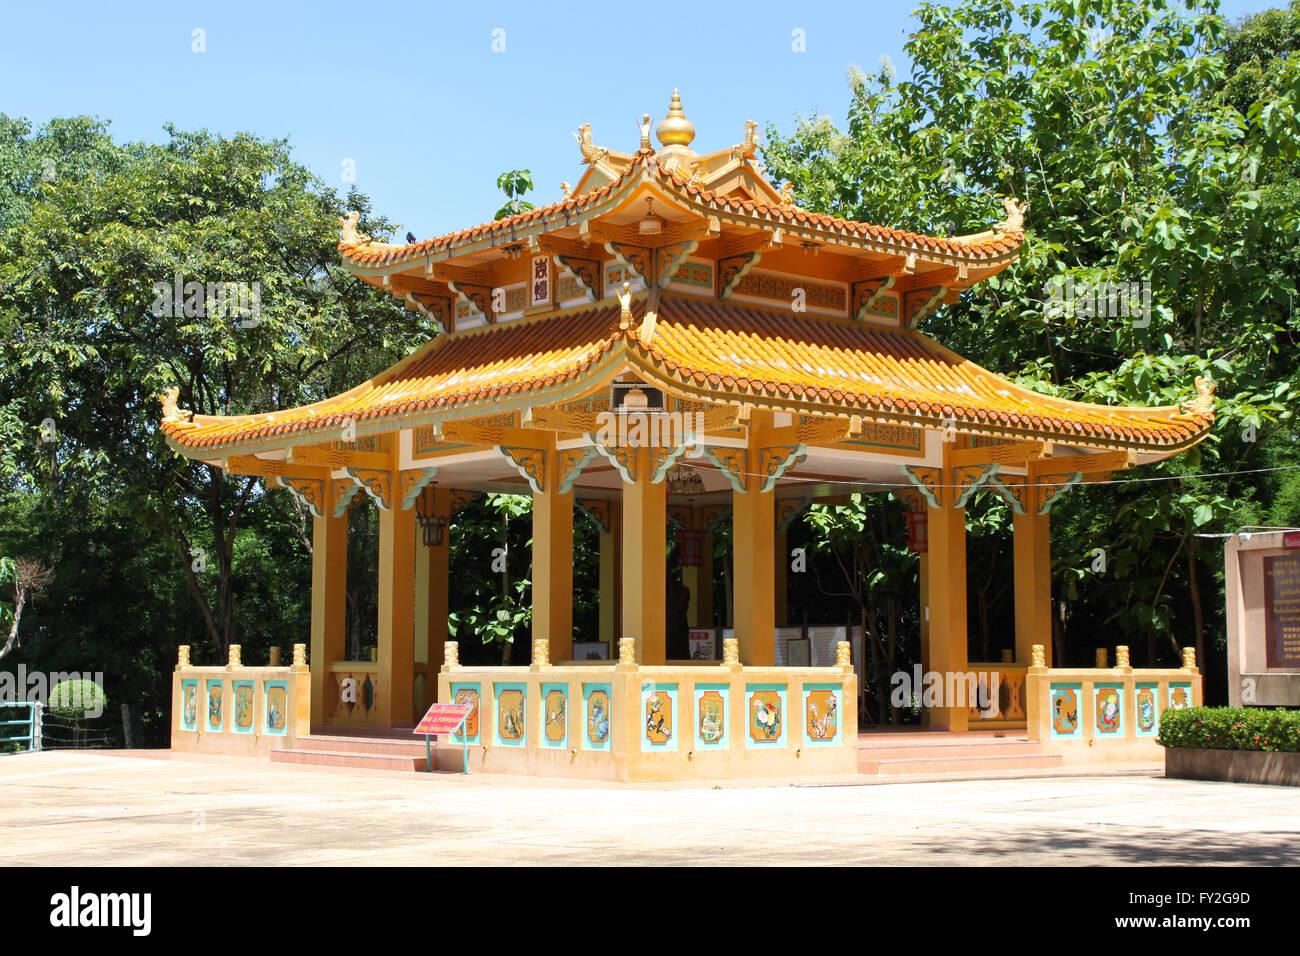 El Monte del Templo Pratamnak, Pattaya, Tailandia Foto de stock